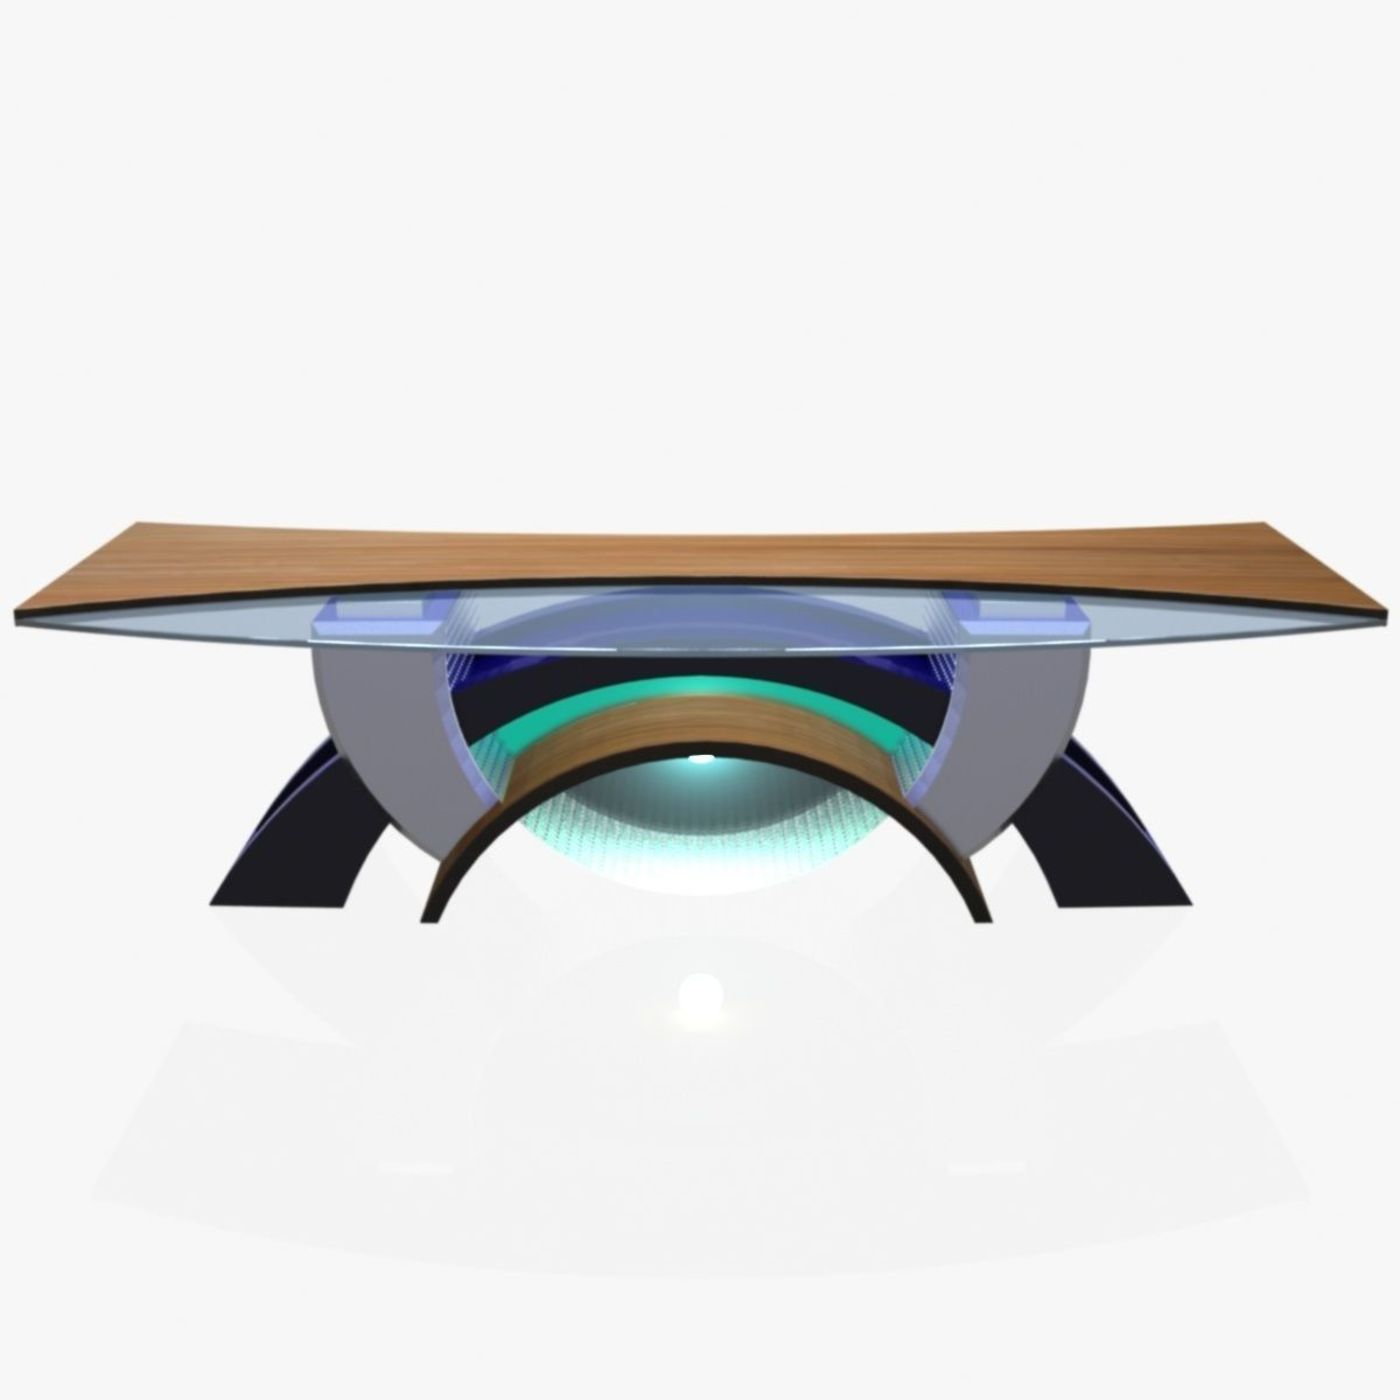 3D TV Studio News Desk 2